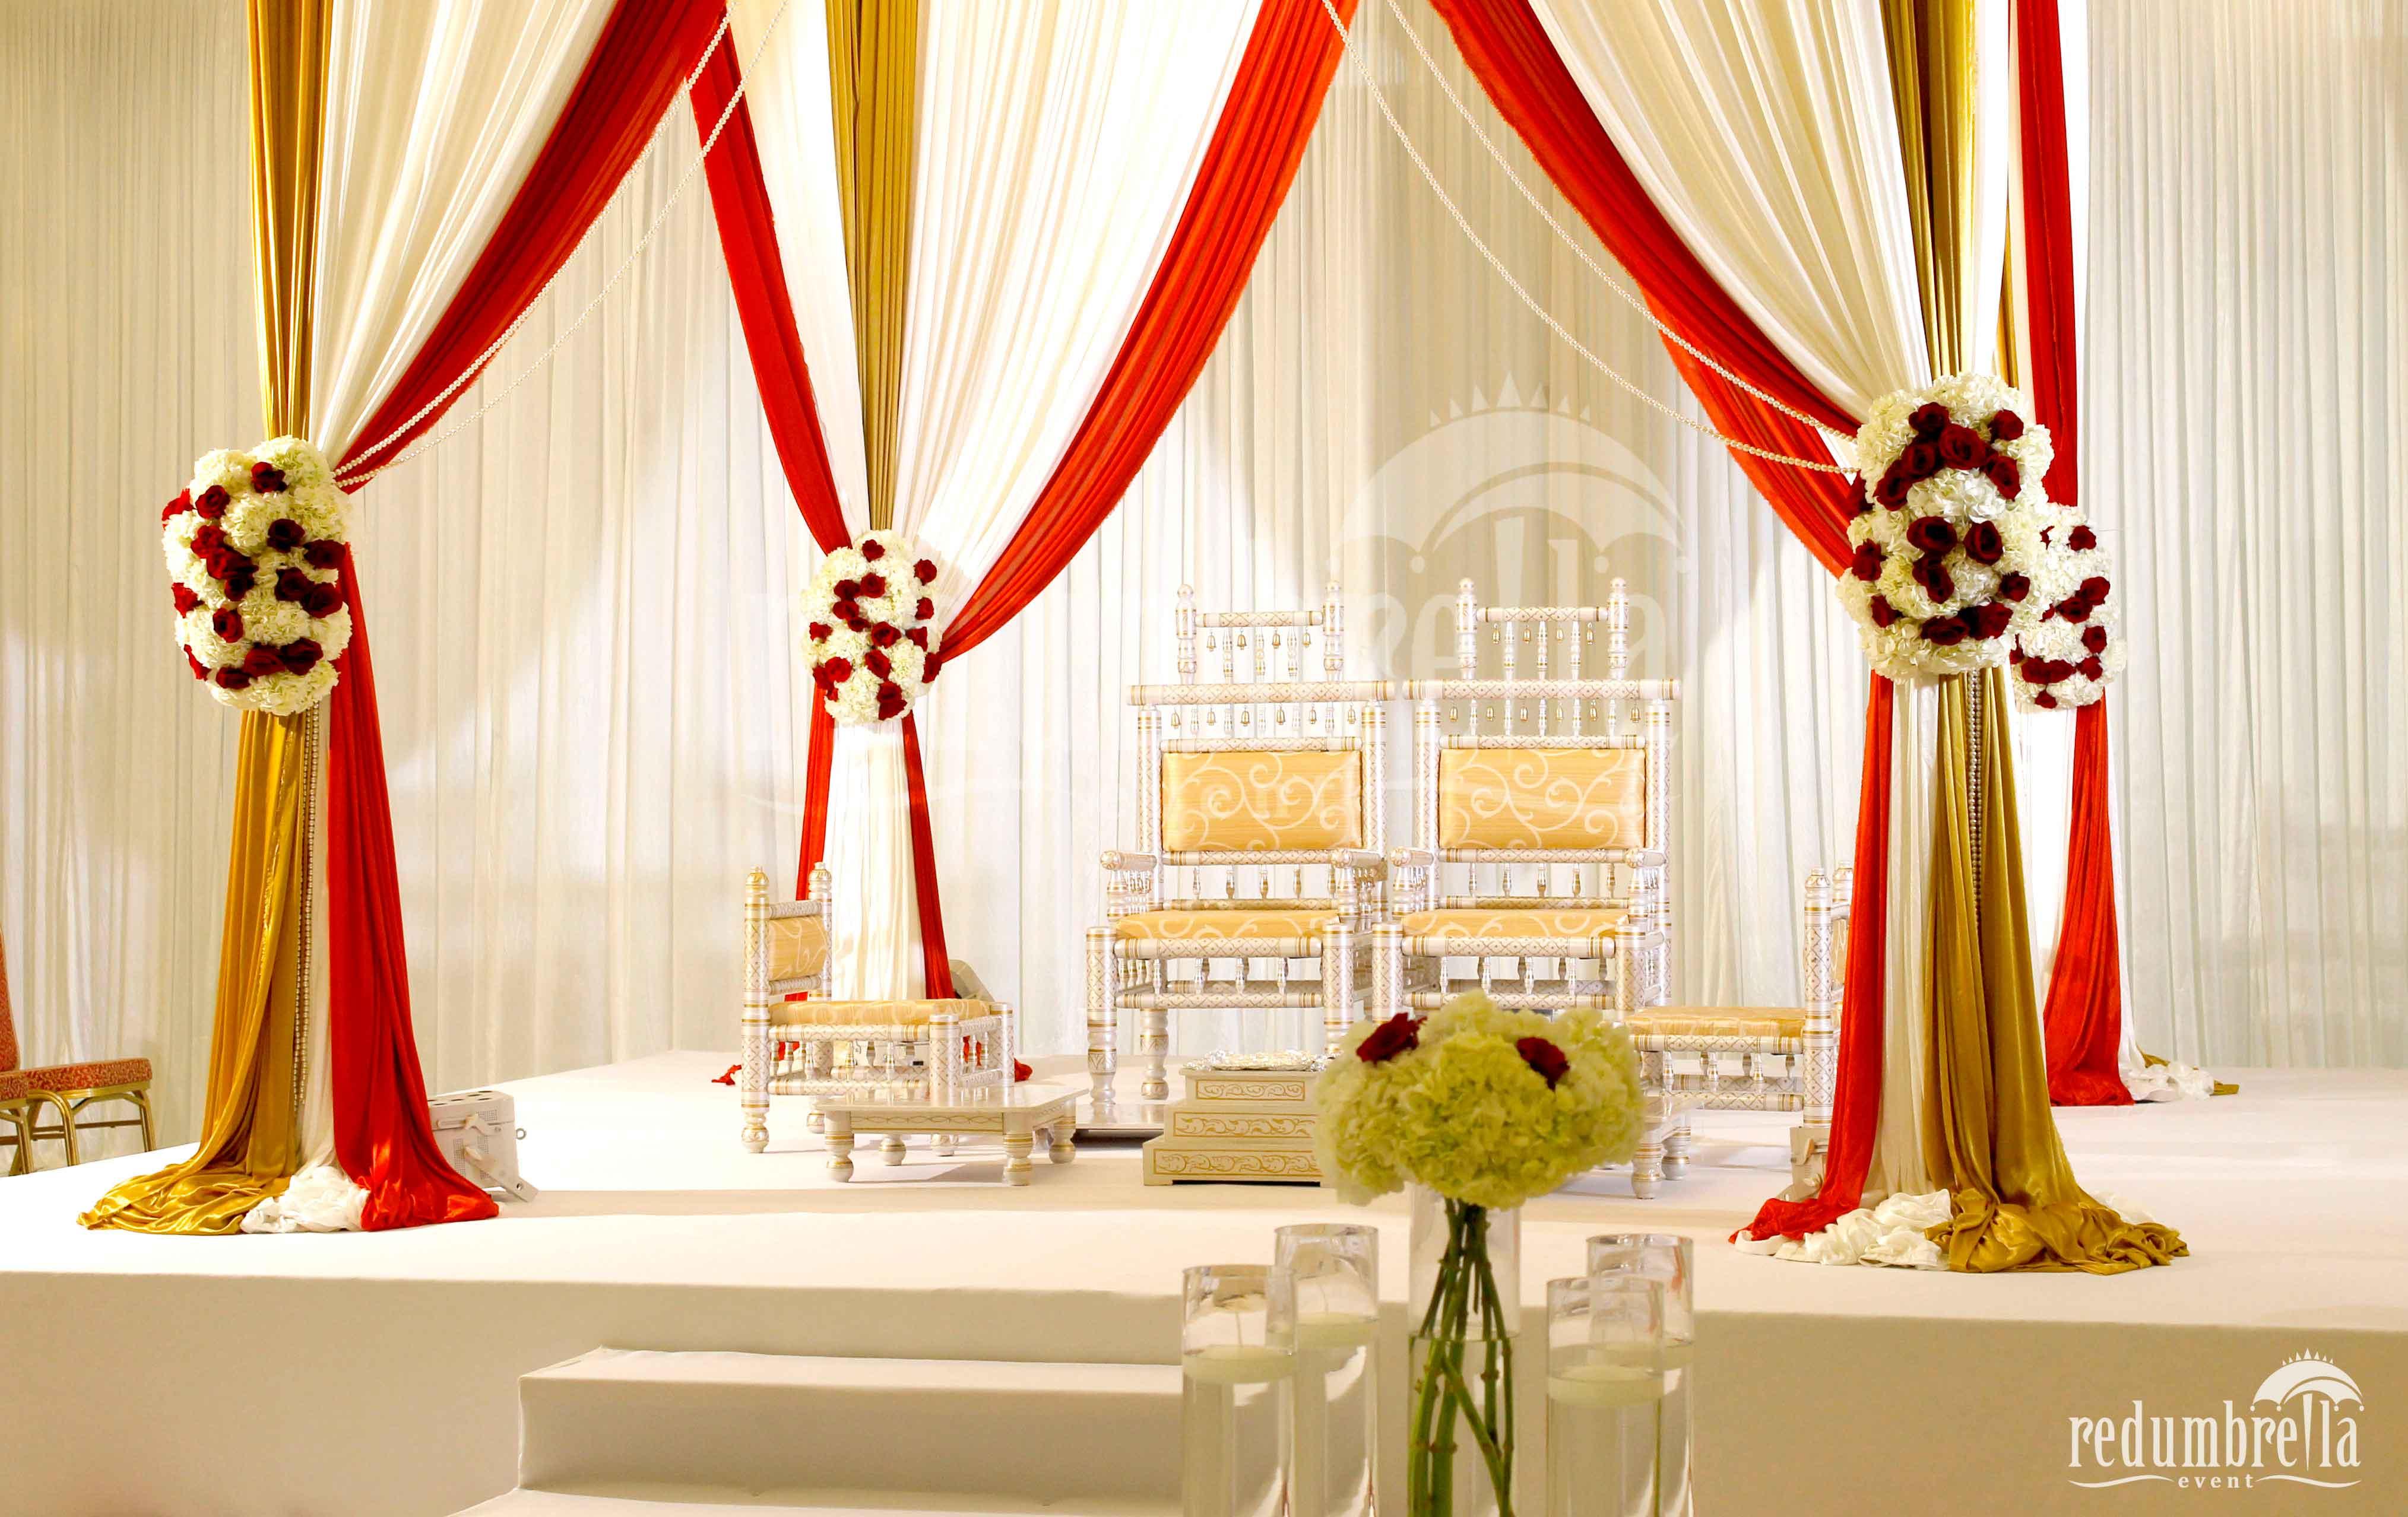 Red Umbrella Indian Wedding Decor Reception Design